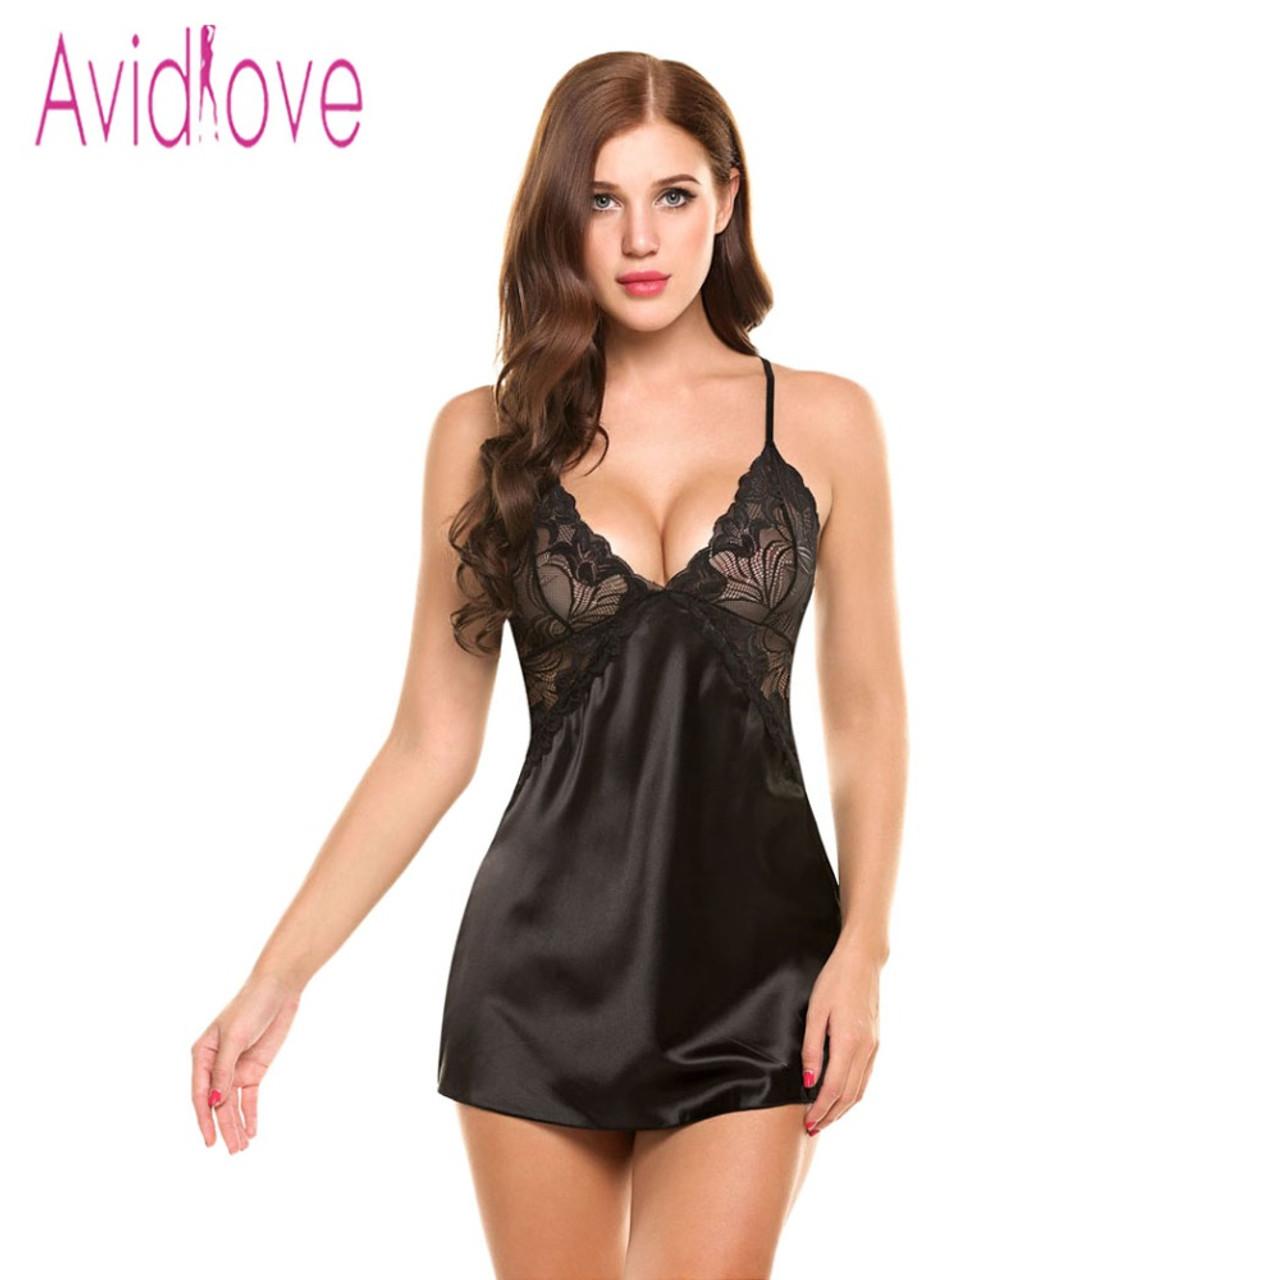 ... Avidlove Sexy Nightgown Lingerie Fashion Patchwork Nightdress Women  Sheer Scalloped Satin Nightwear Silk Slip Sleepwear Chemises ... b77b5659b